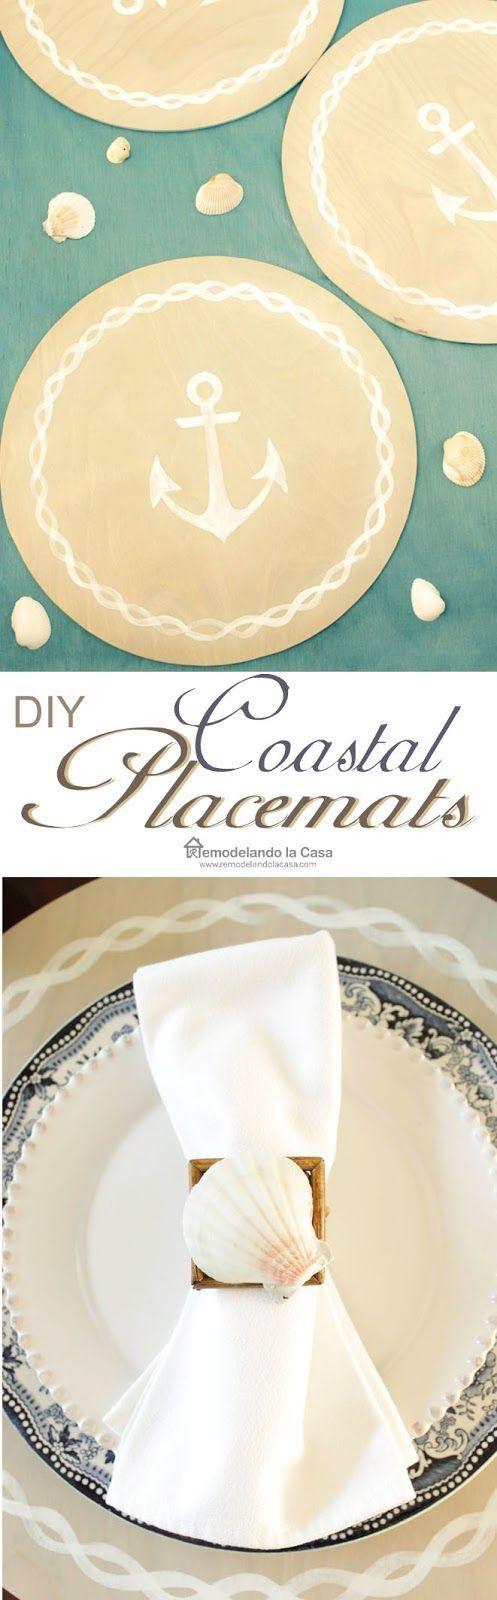 best  nautical placemats ideas on pinterest  rope decor  - diy  coastal placemats